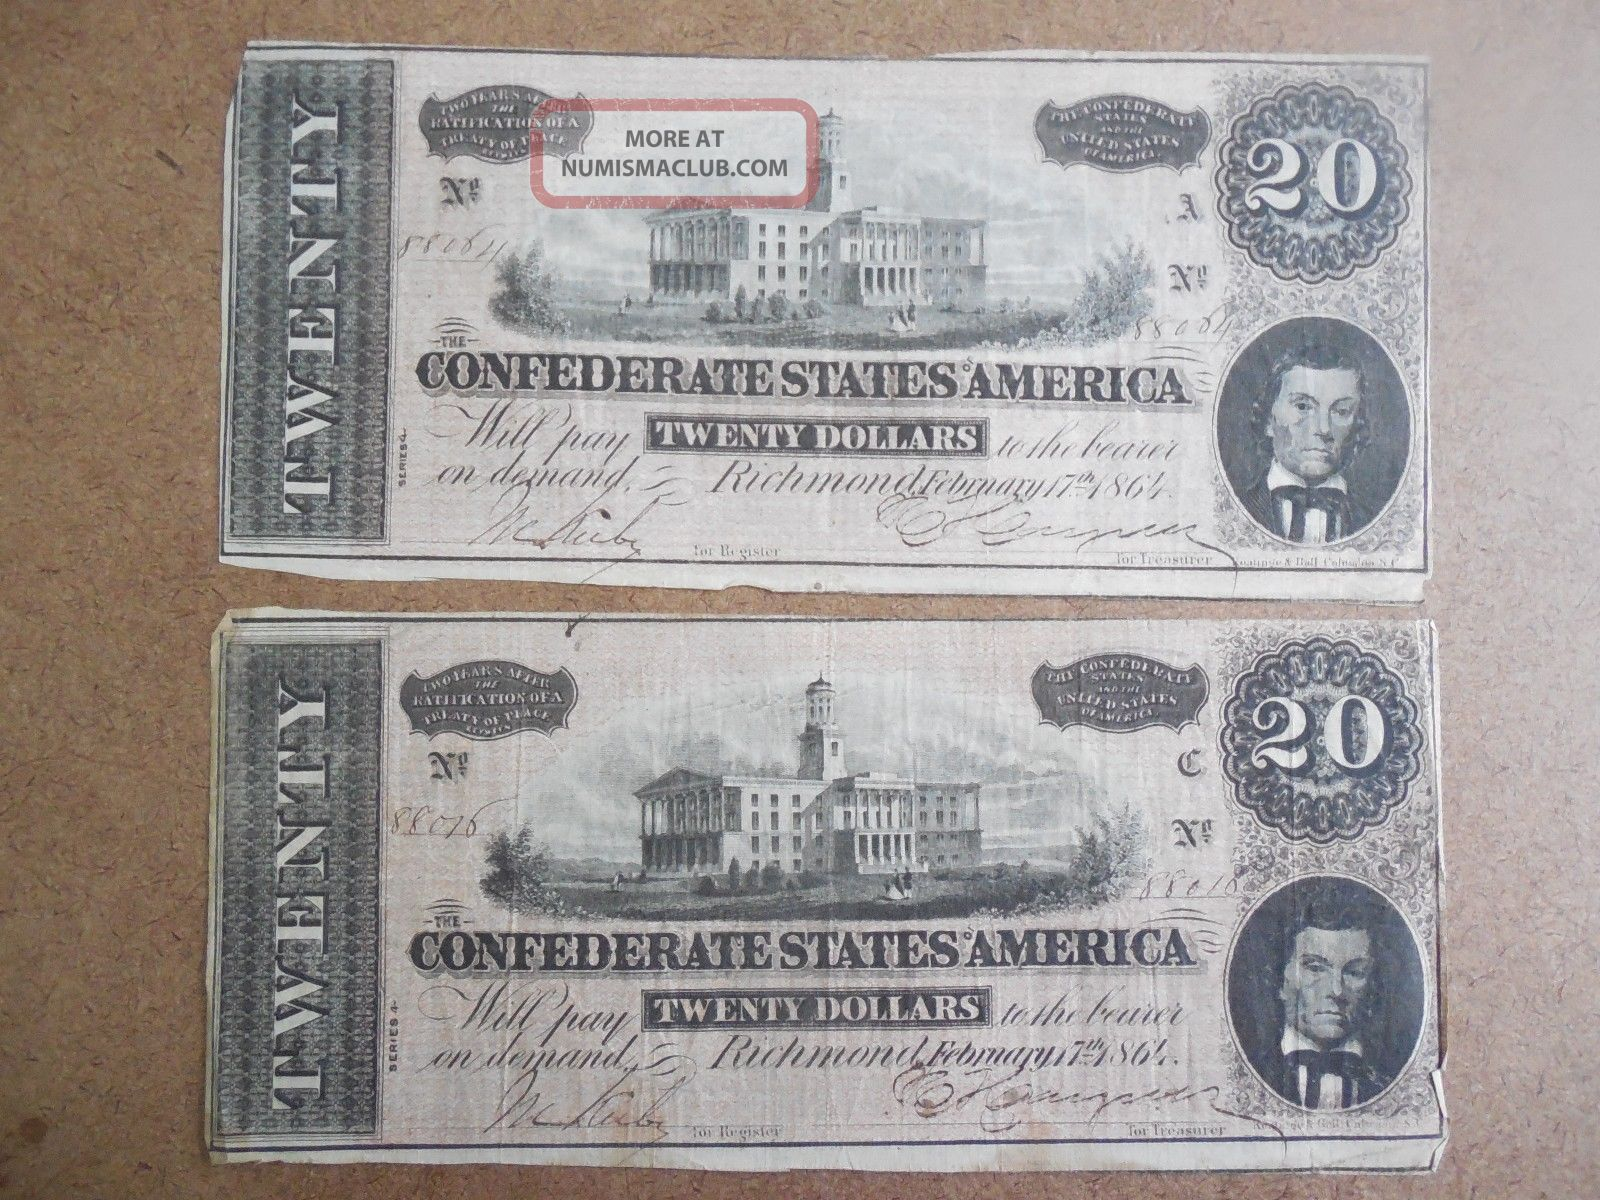 2 - 1864 Confederate States America $20 Twenty Dollar Bill Civil War Currency Paper Money: US photo